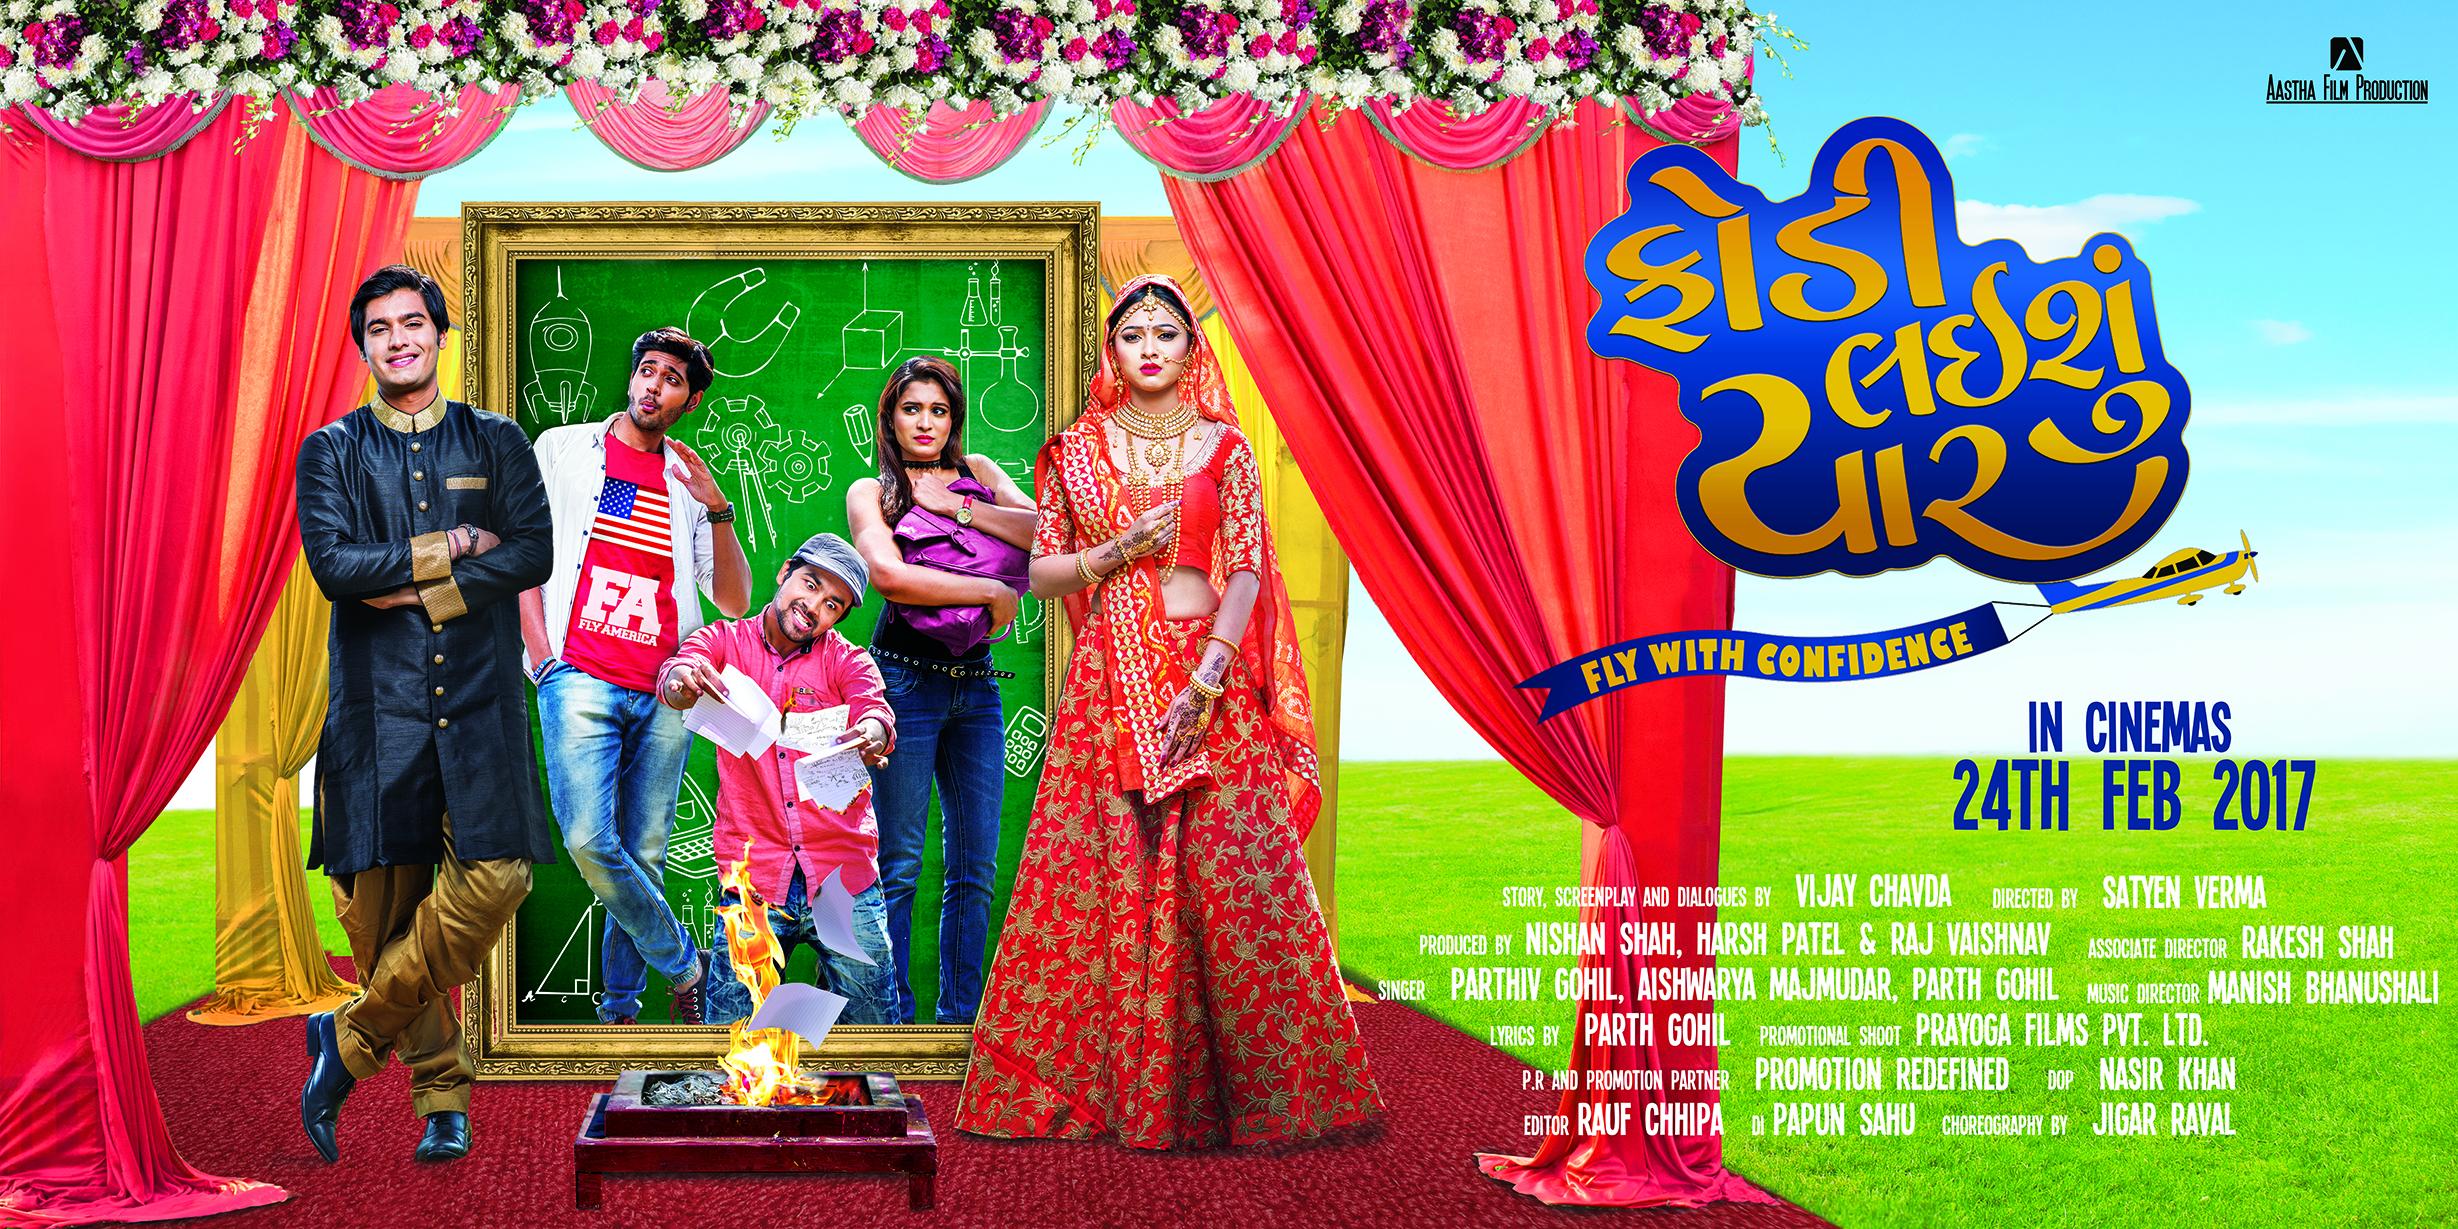 fodi laishu yaar movie download